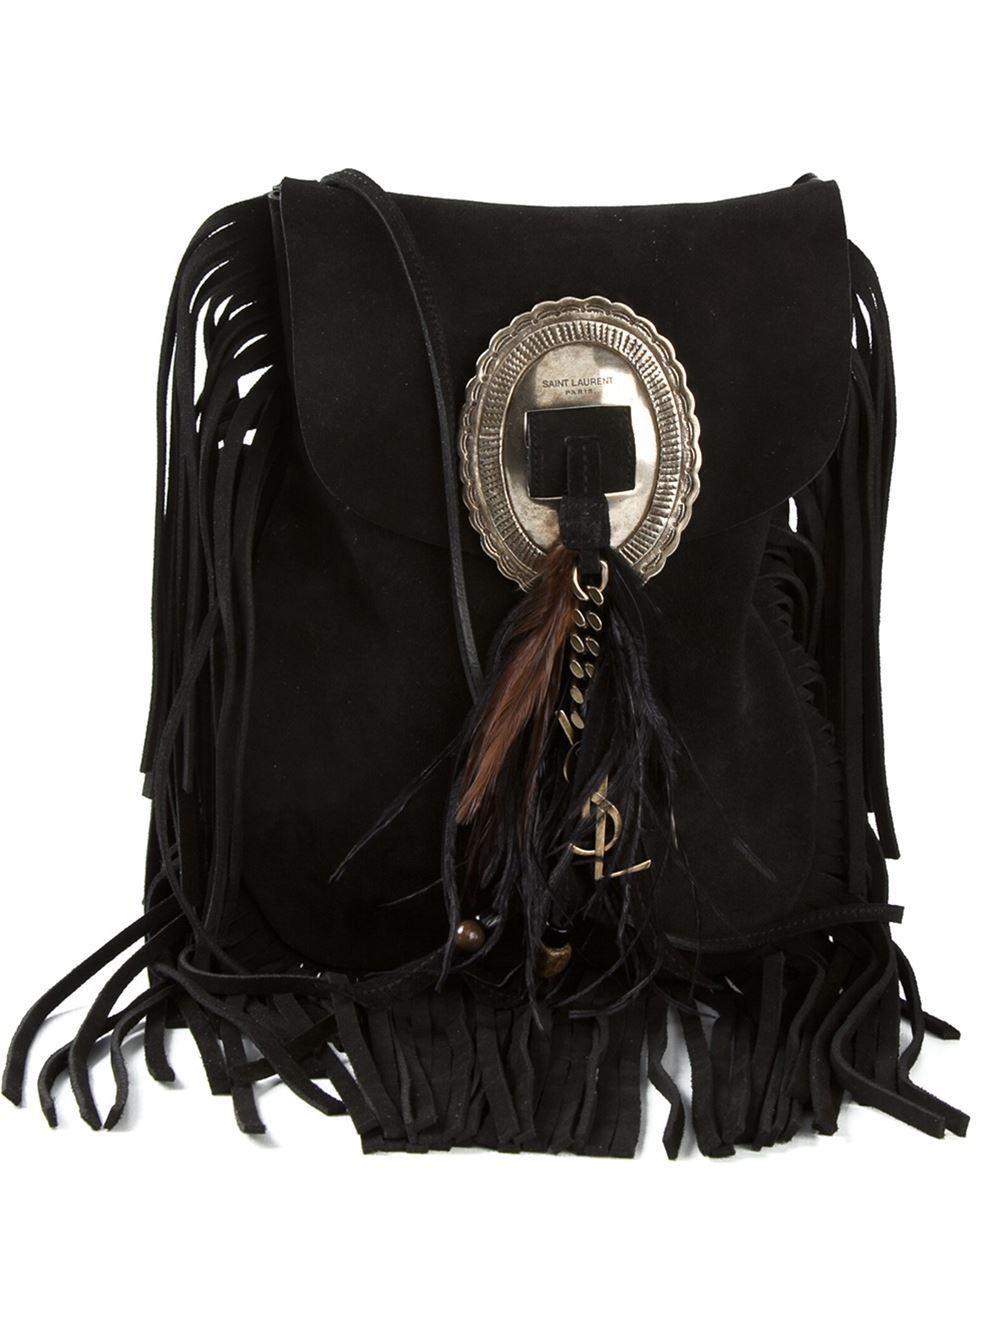 6387f18cc98a Saint Laurent Anita Leather Shoulder Bag in Black - Lyst